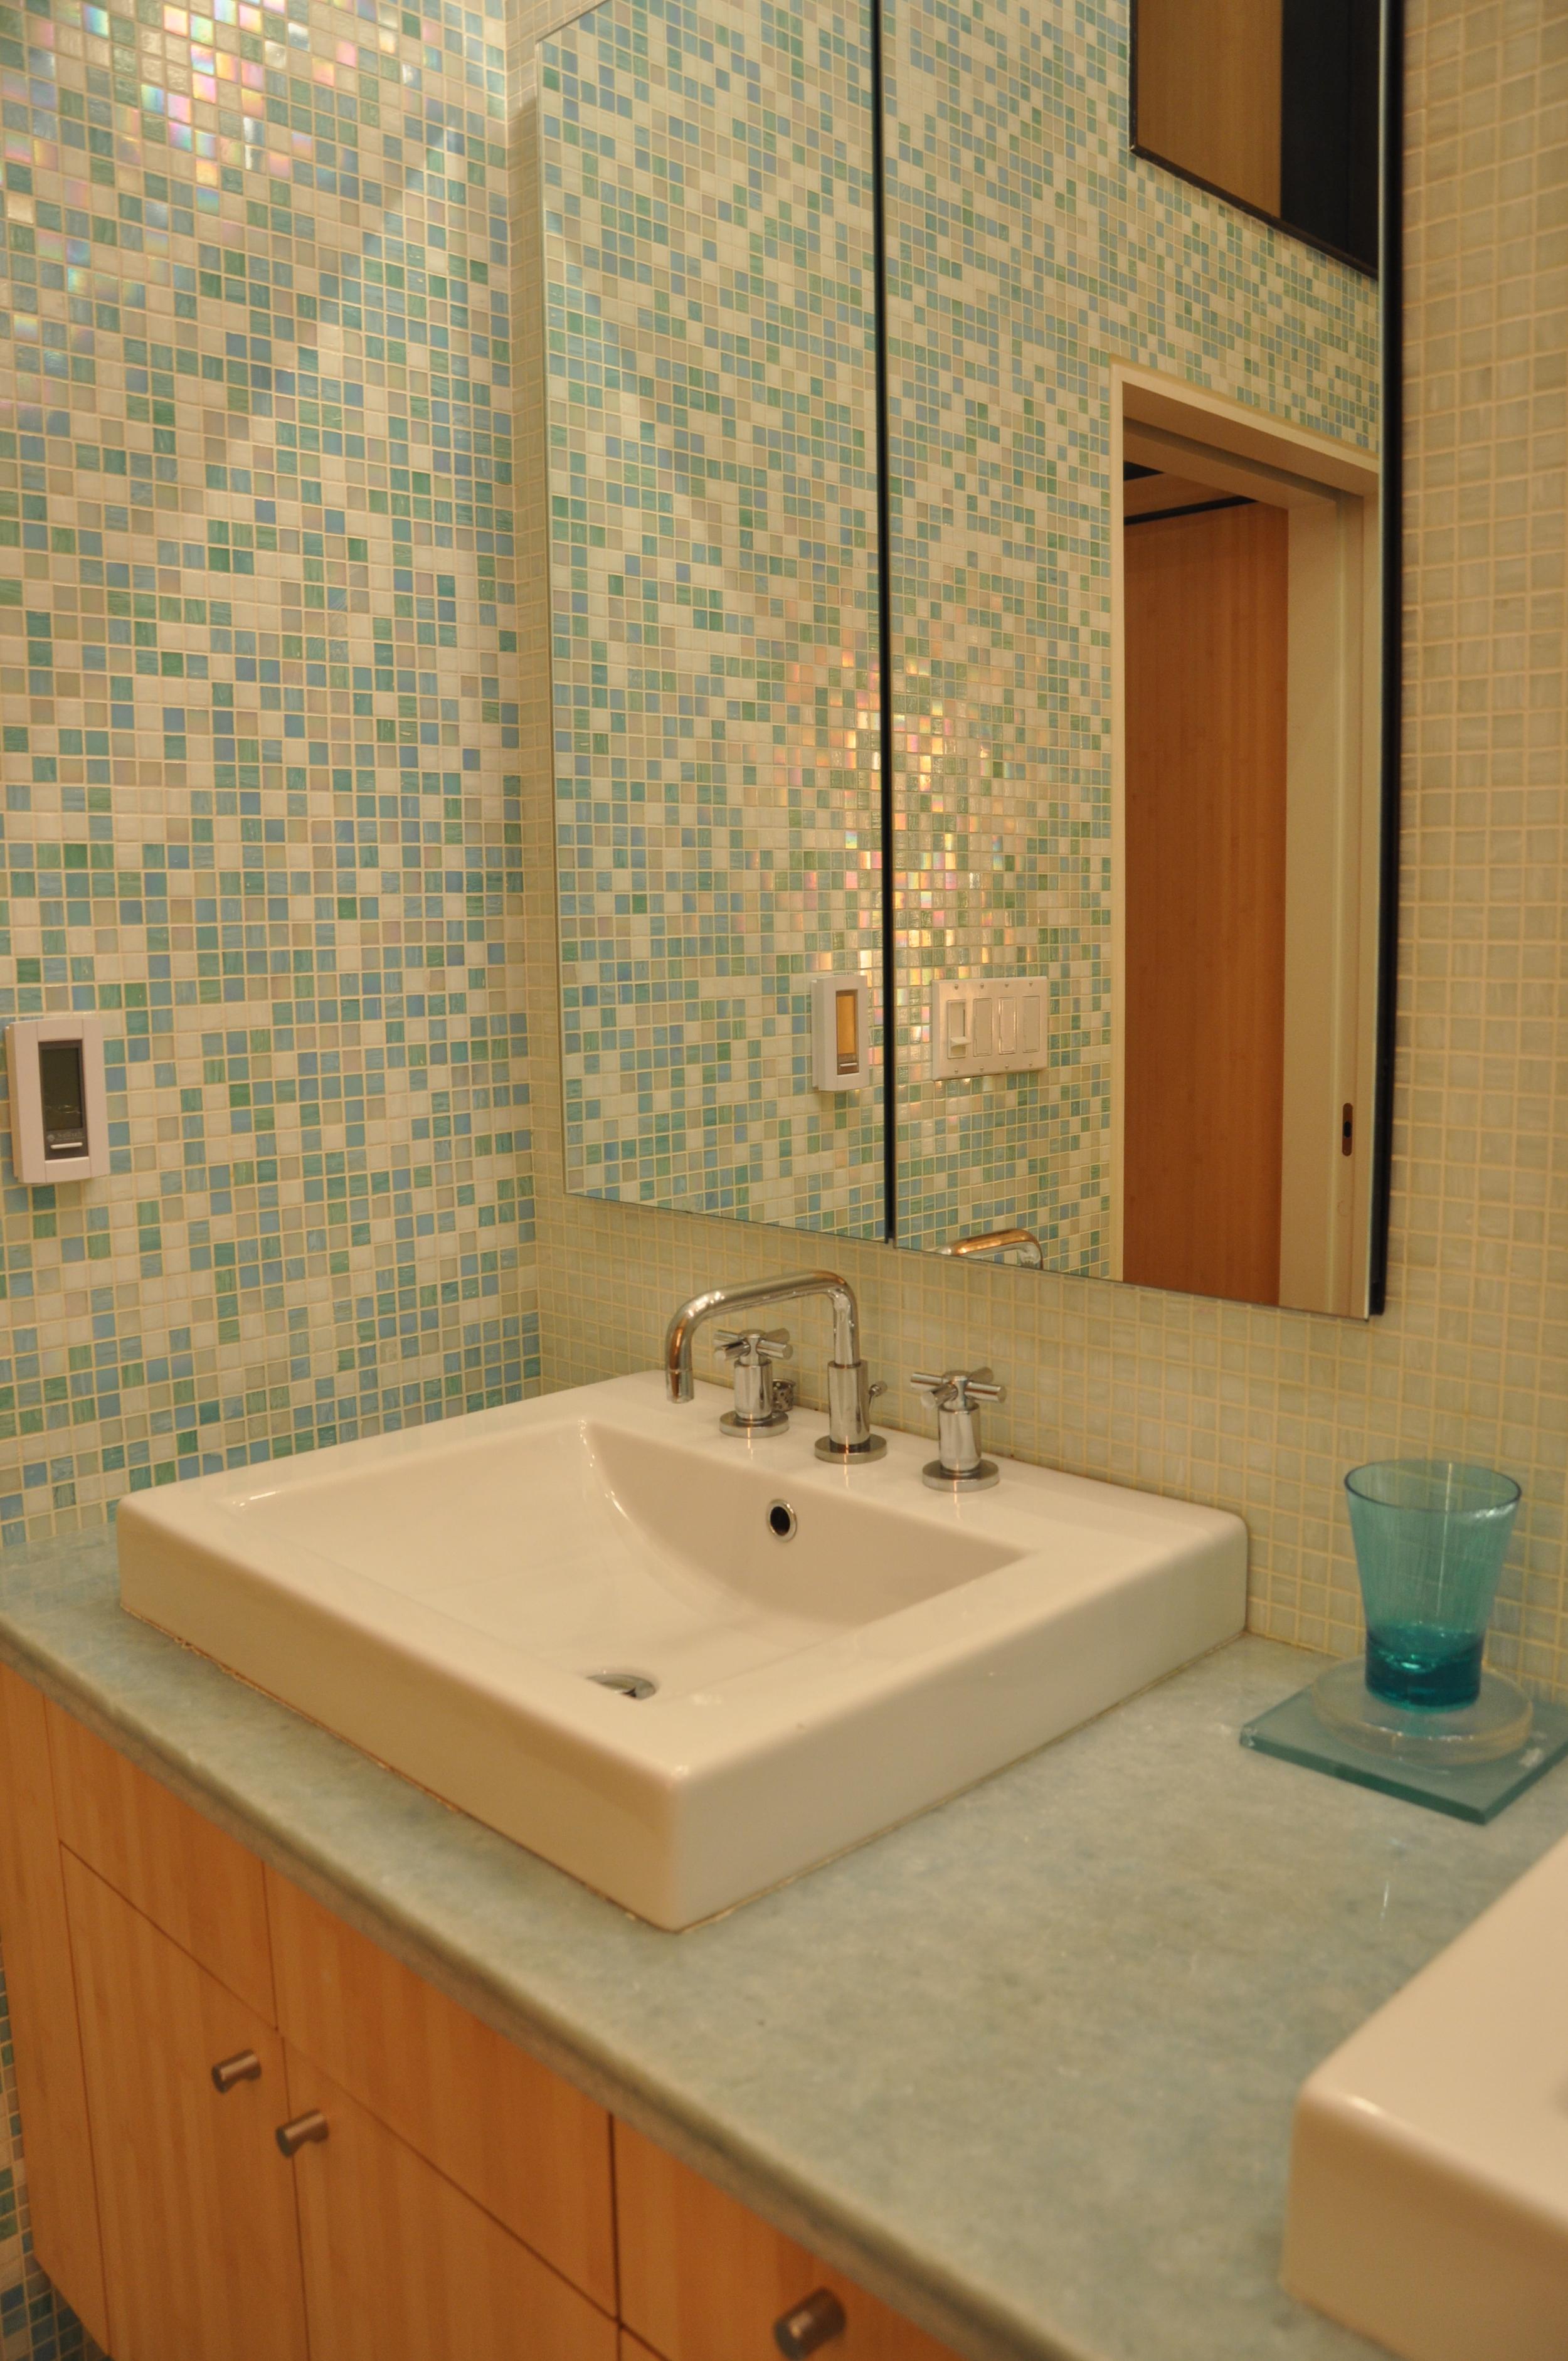 Good mstr Bath Vanity mirror.JPG